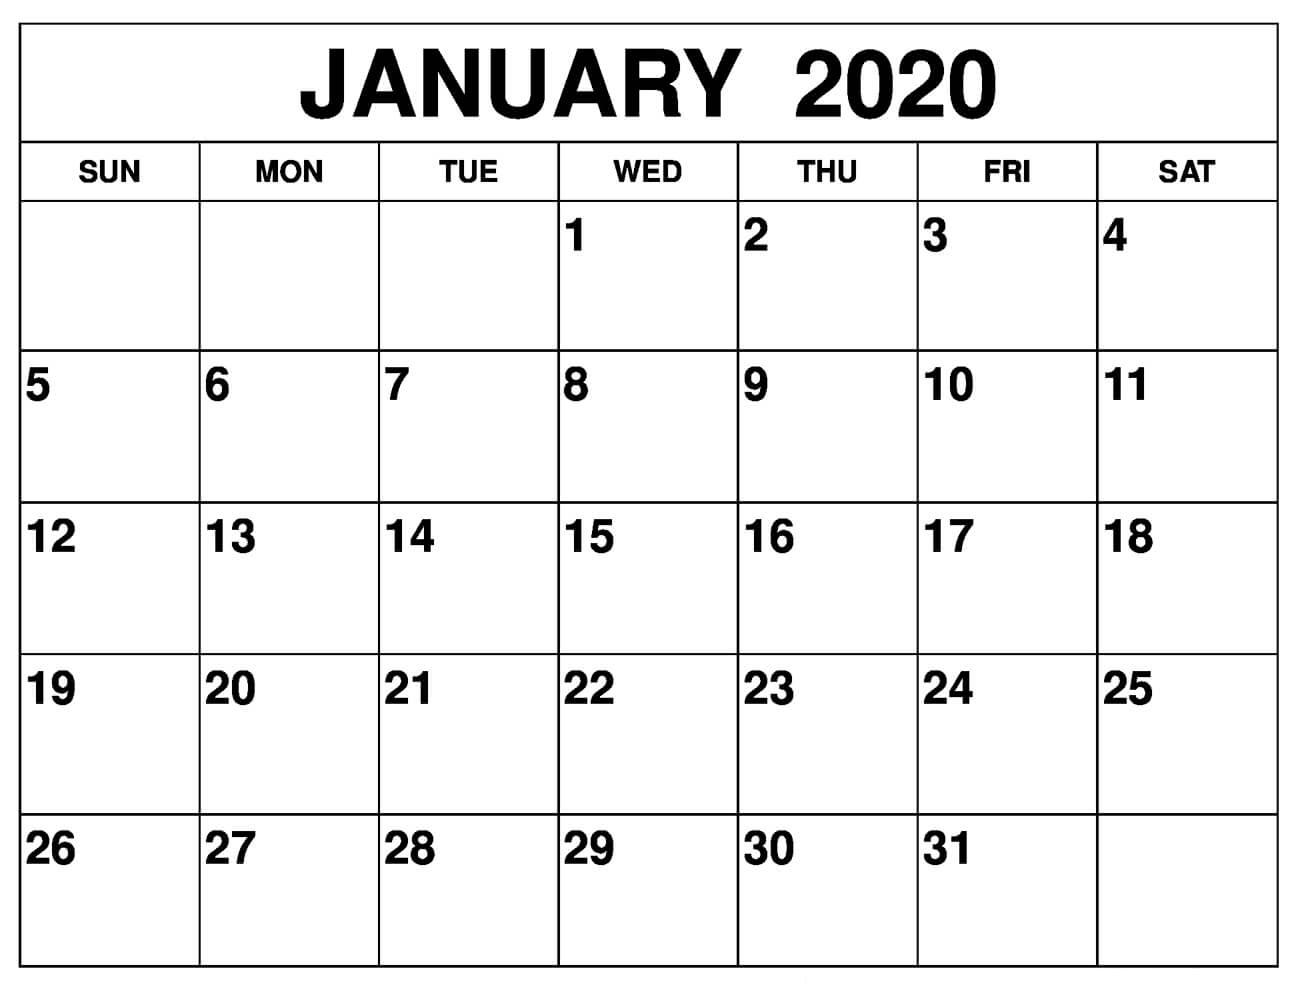 January 2020 Printable Calendar Monthly   12 Month Printable